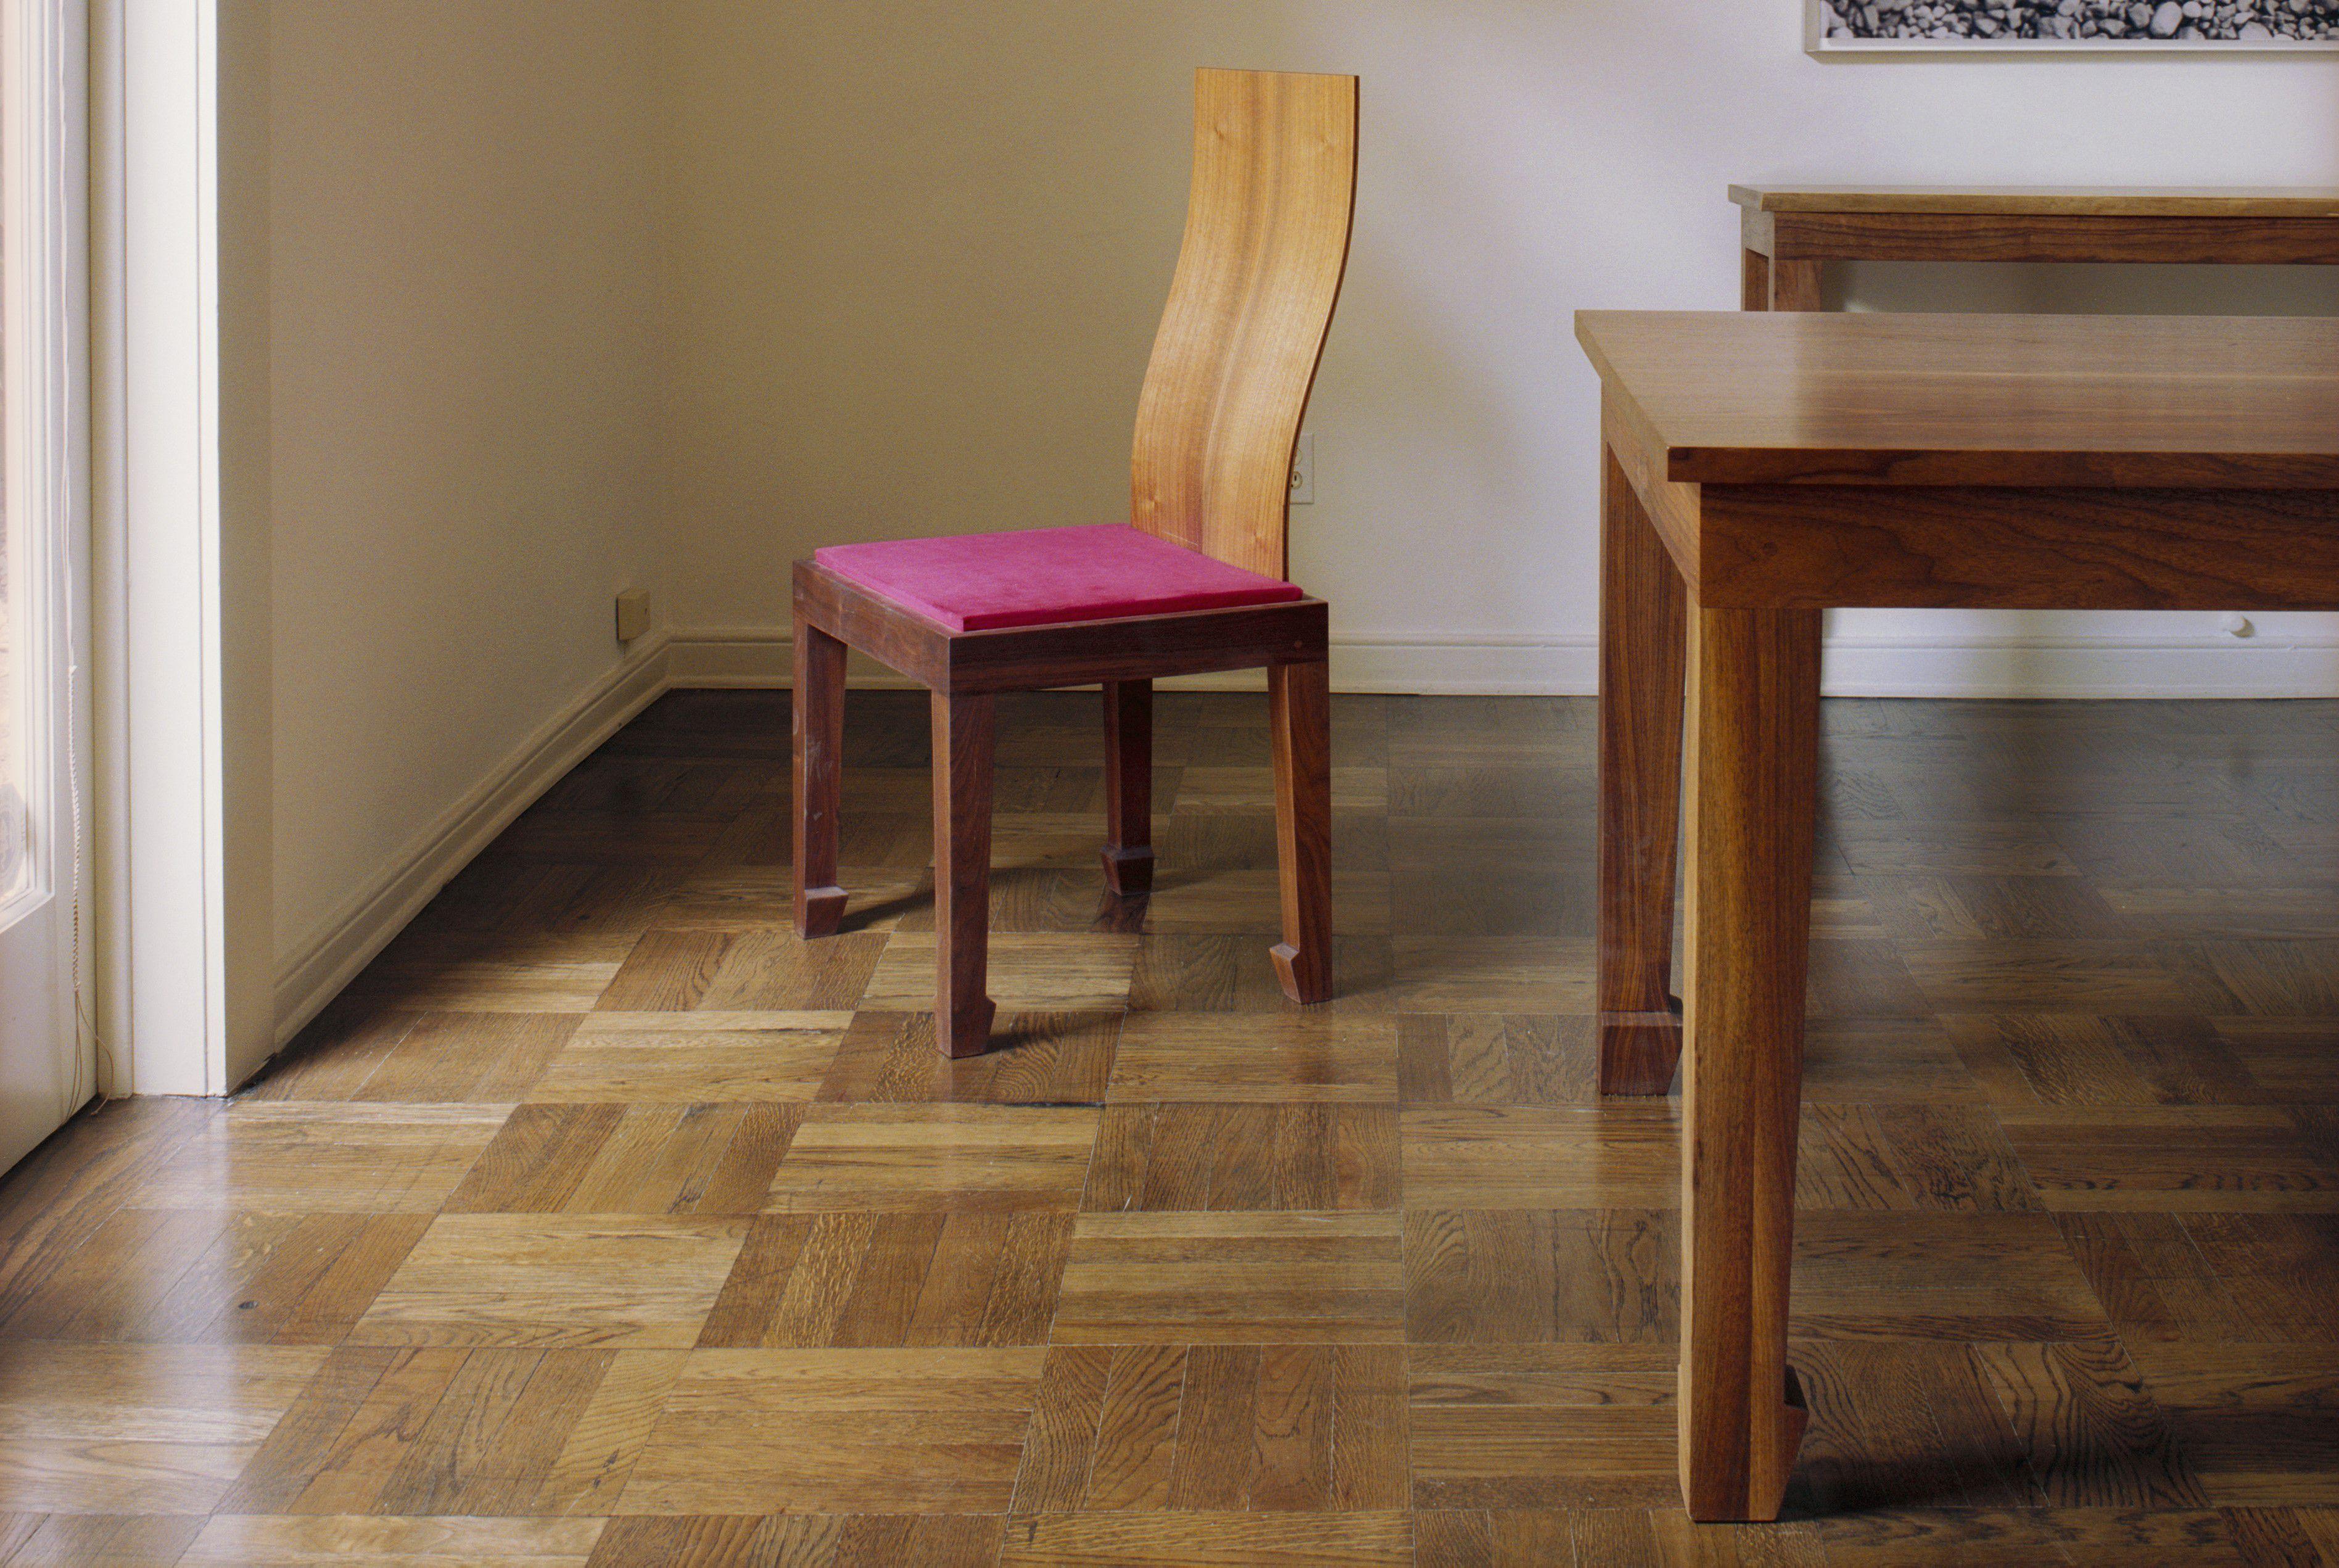 hardwood flooring toronto ontario of wood parquet flooring poised for a resurgence in wood parquet flooring 529502452 576c78195f9b585875a1ac13